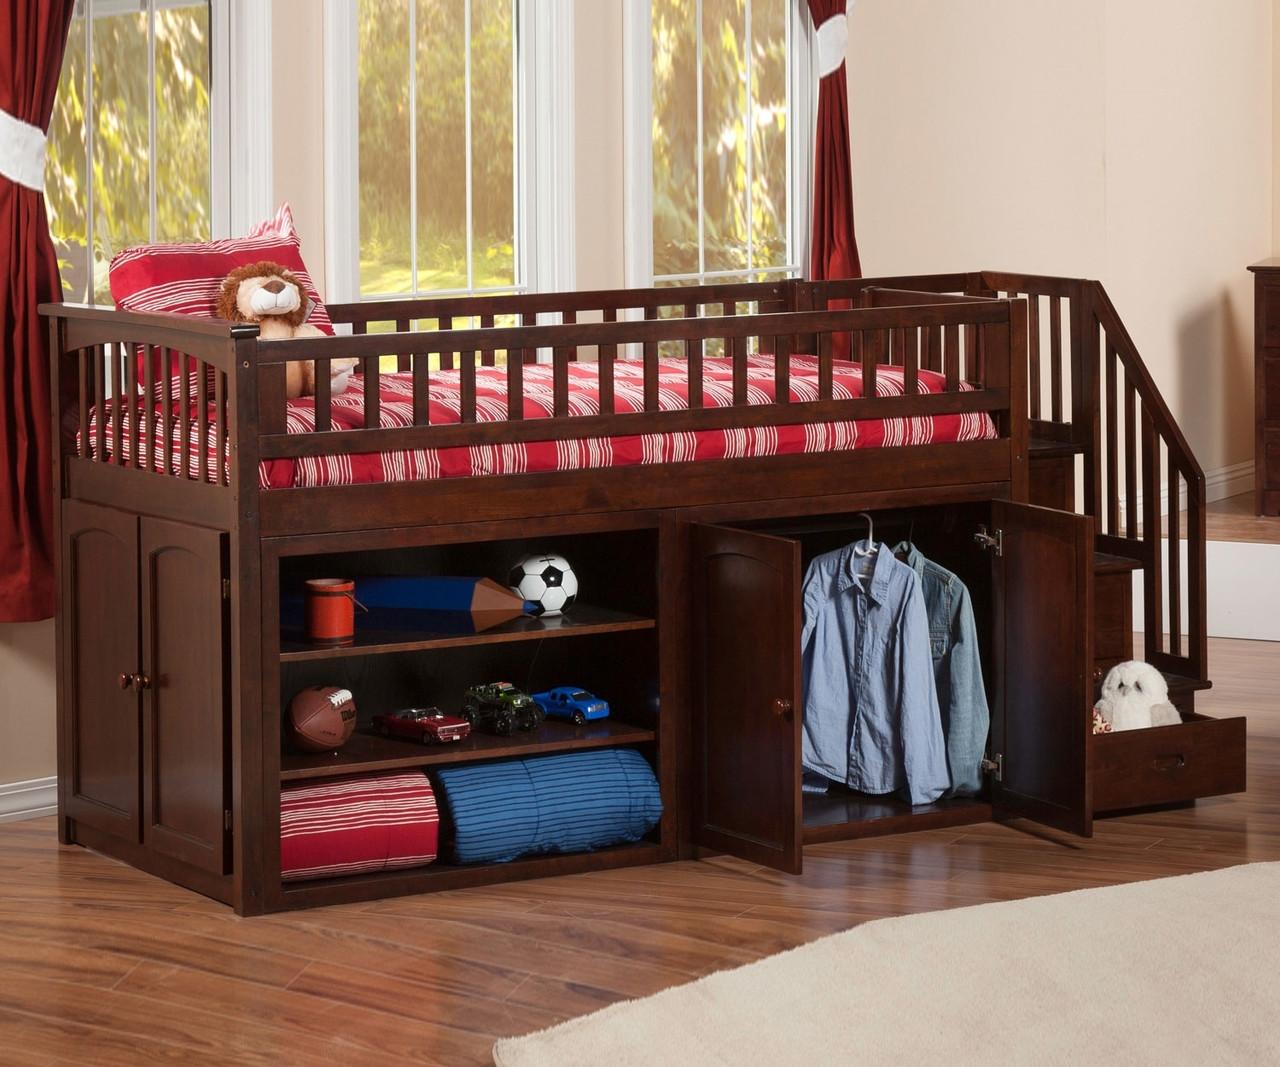 mini stair loft bunk bed atlantic furniture solid wood bedroom furniture in antique walnut. Black Bedroom Furniture Sets. Home Design Ideas